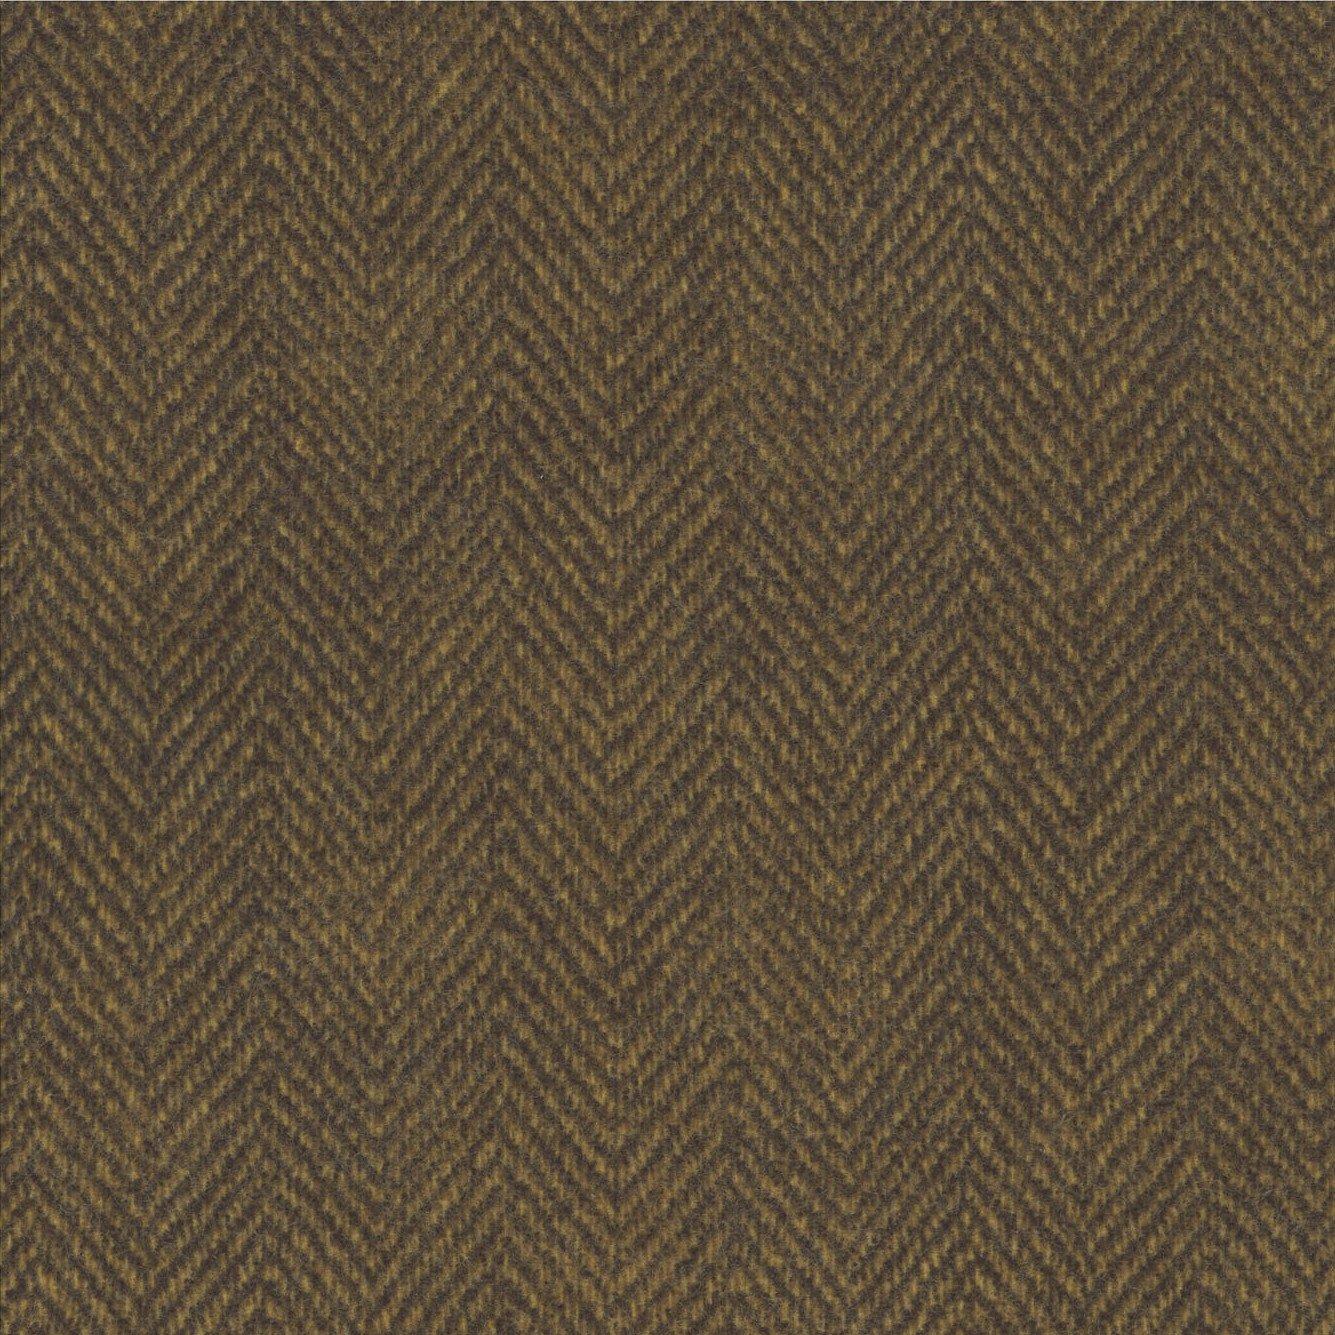 Woolies Flannel Herringbone Espresso (MASF1841-J)